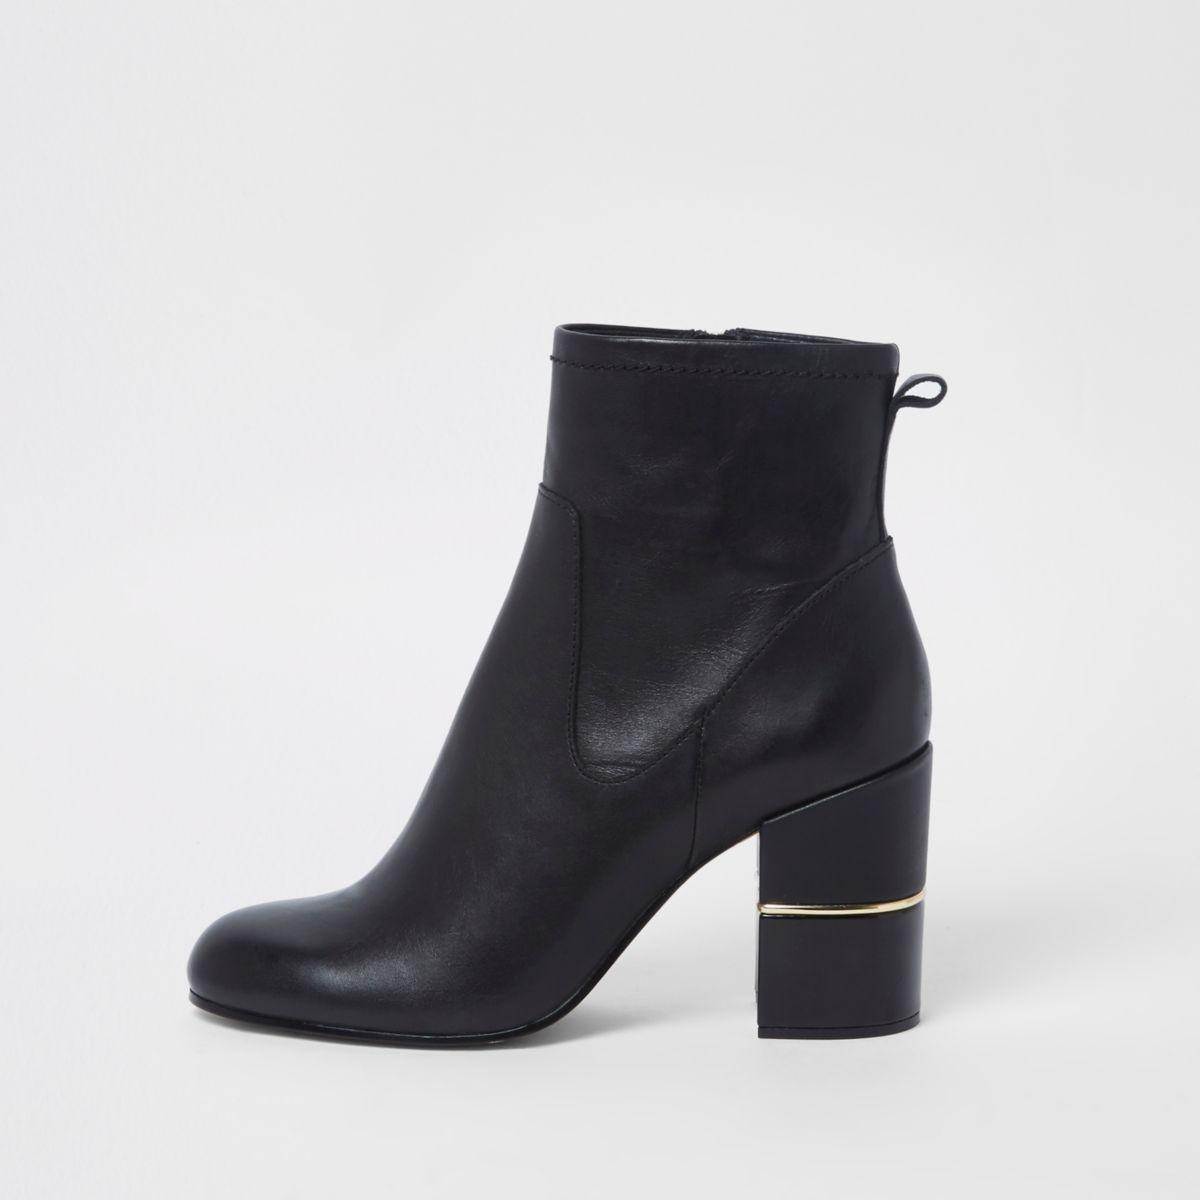 Black leather block heel heel ankle boots